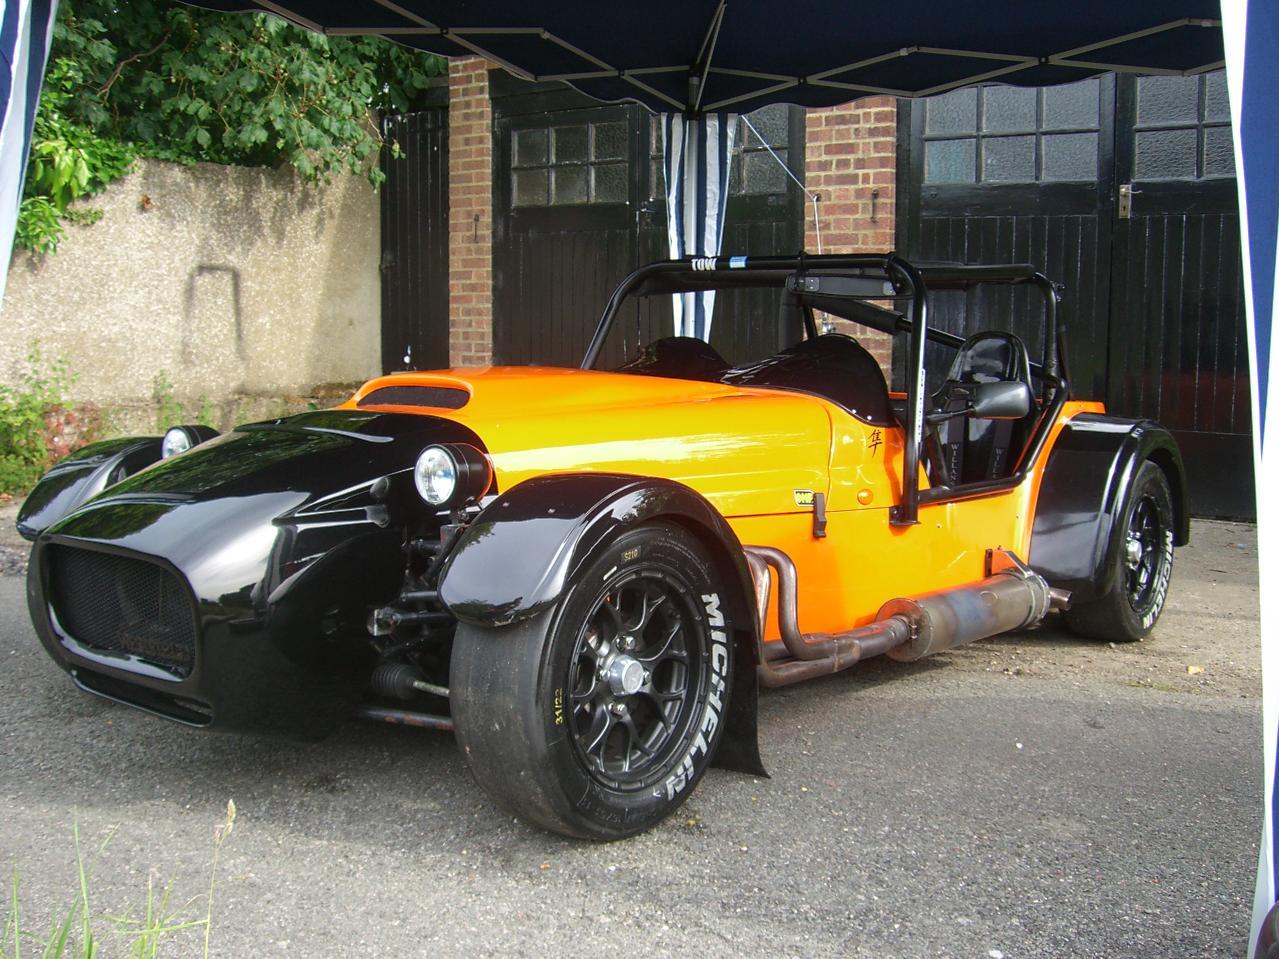 Street Legal Race Cars For Sale >> Westfield Megabusa Road Legal Race/Track Car - Price ...